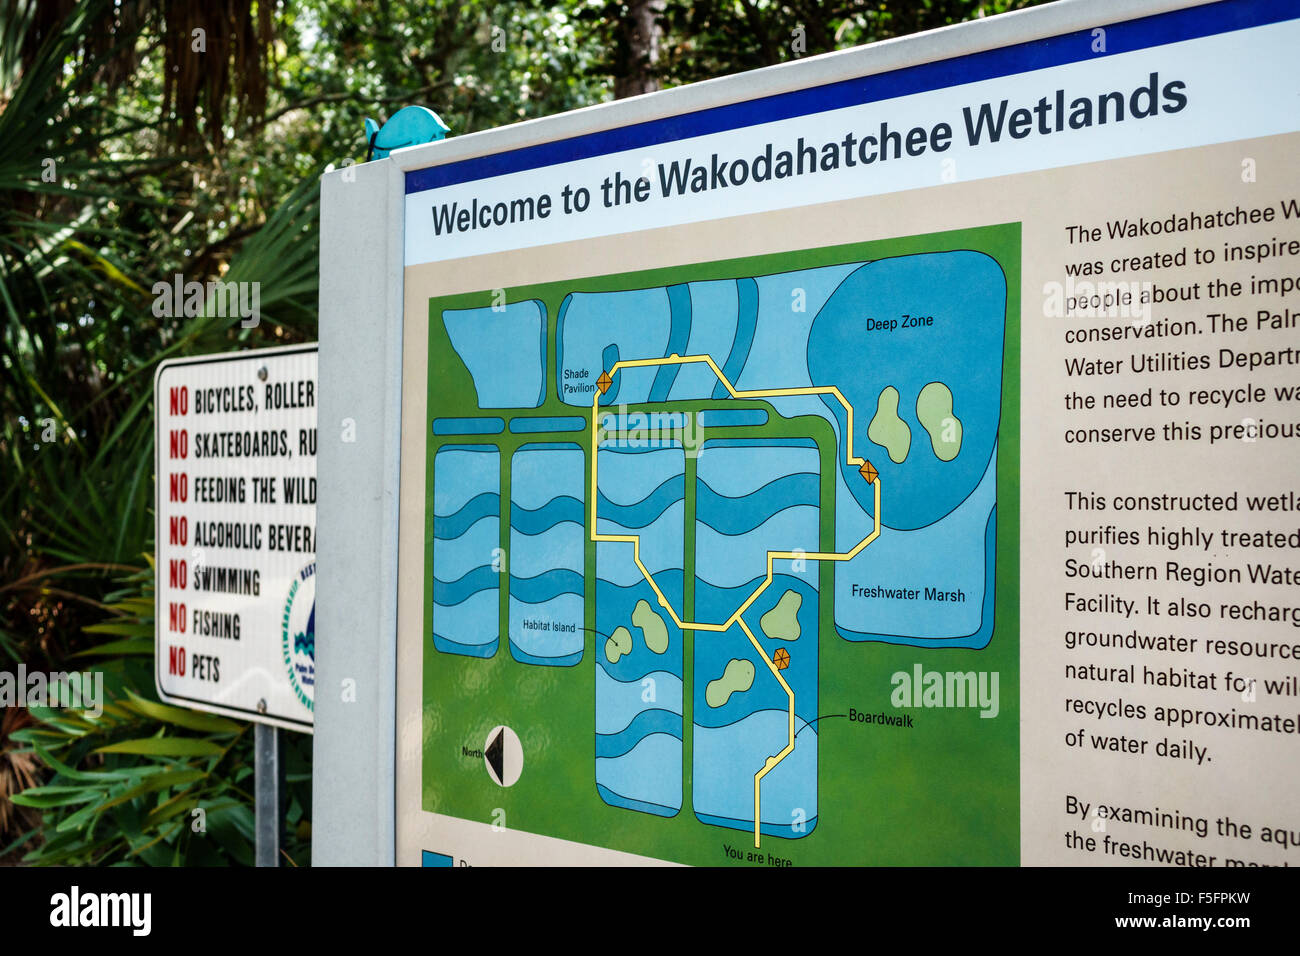 Map Of Florida Delray Beach.Florida Delray Beach Wakodahatchee Wetlands Nature Preserve Sign